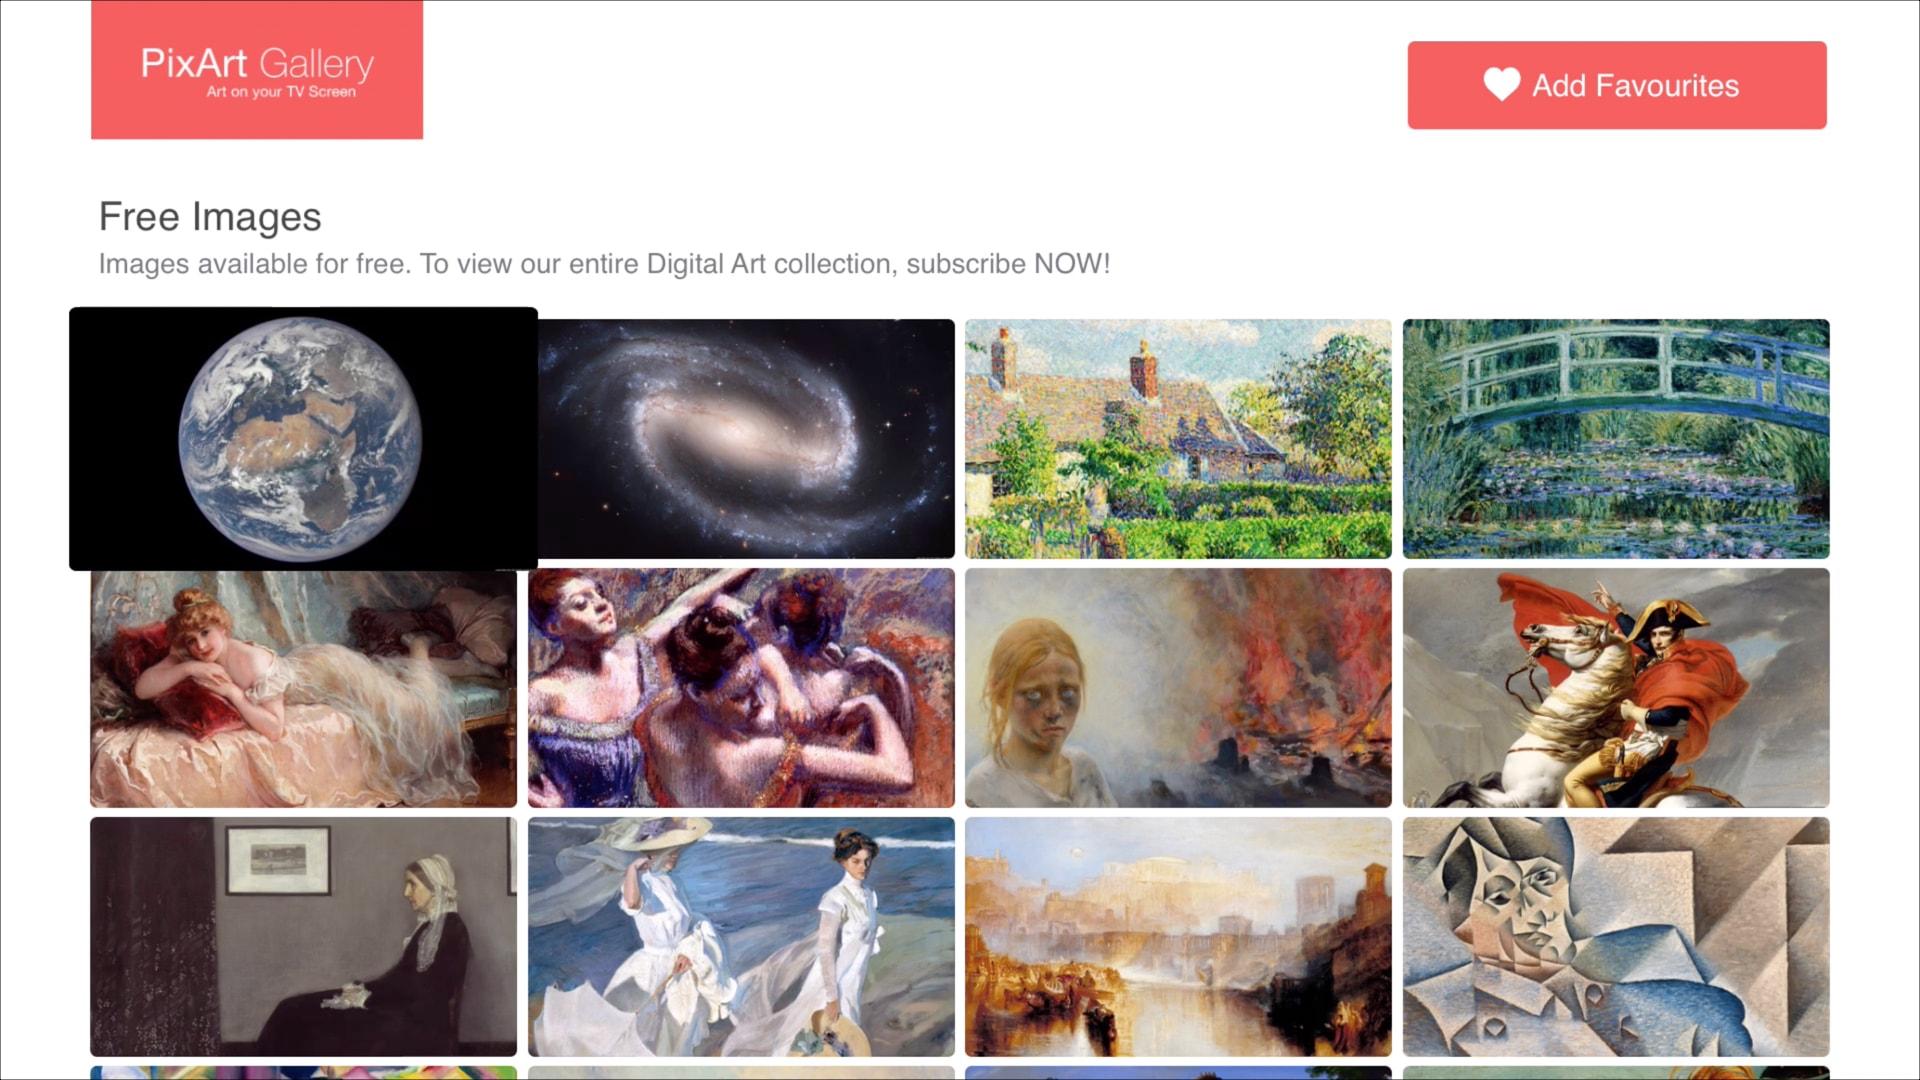 PixArt Gallery free images